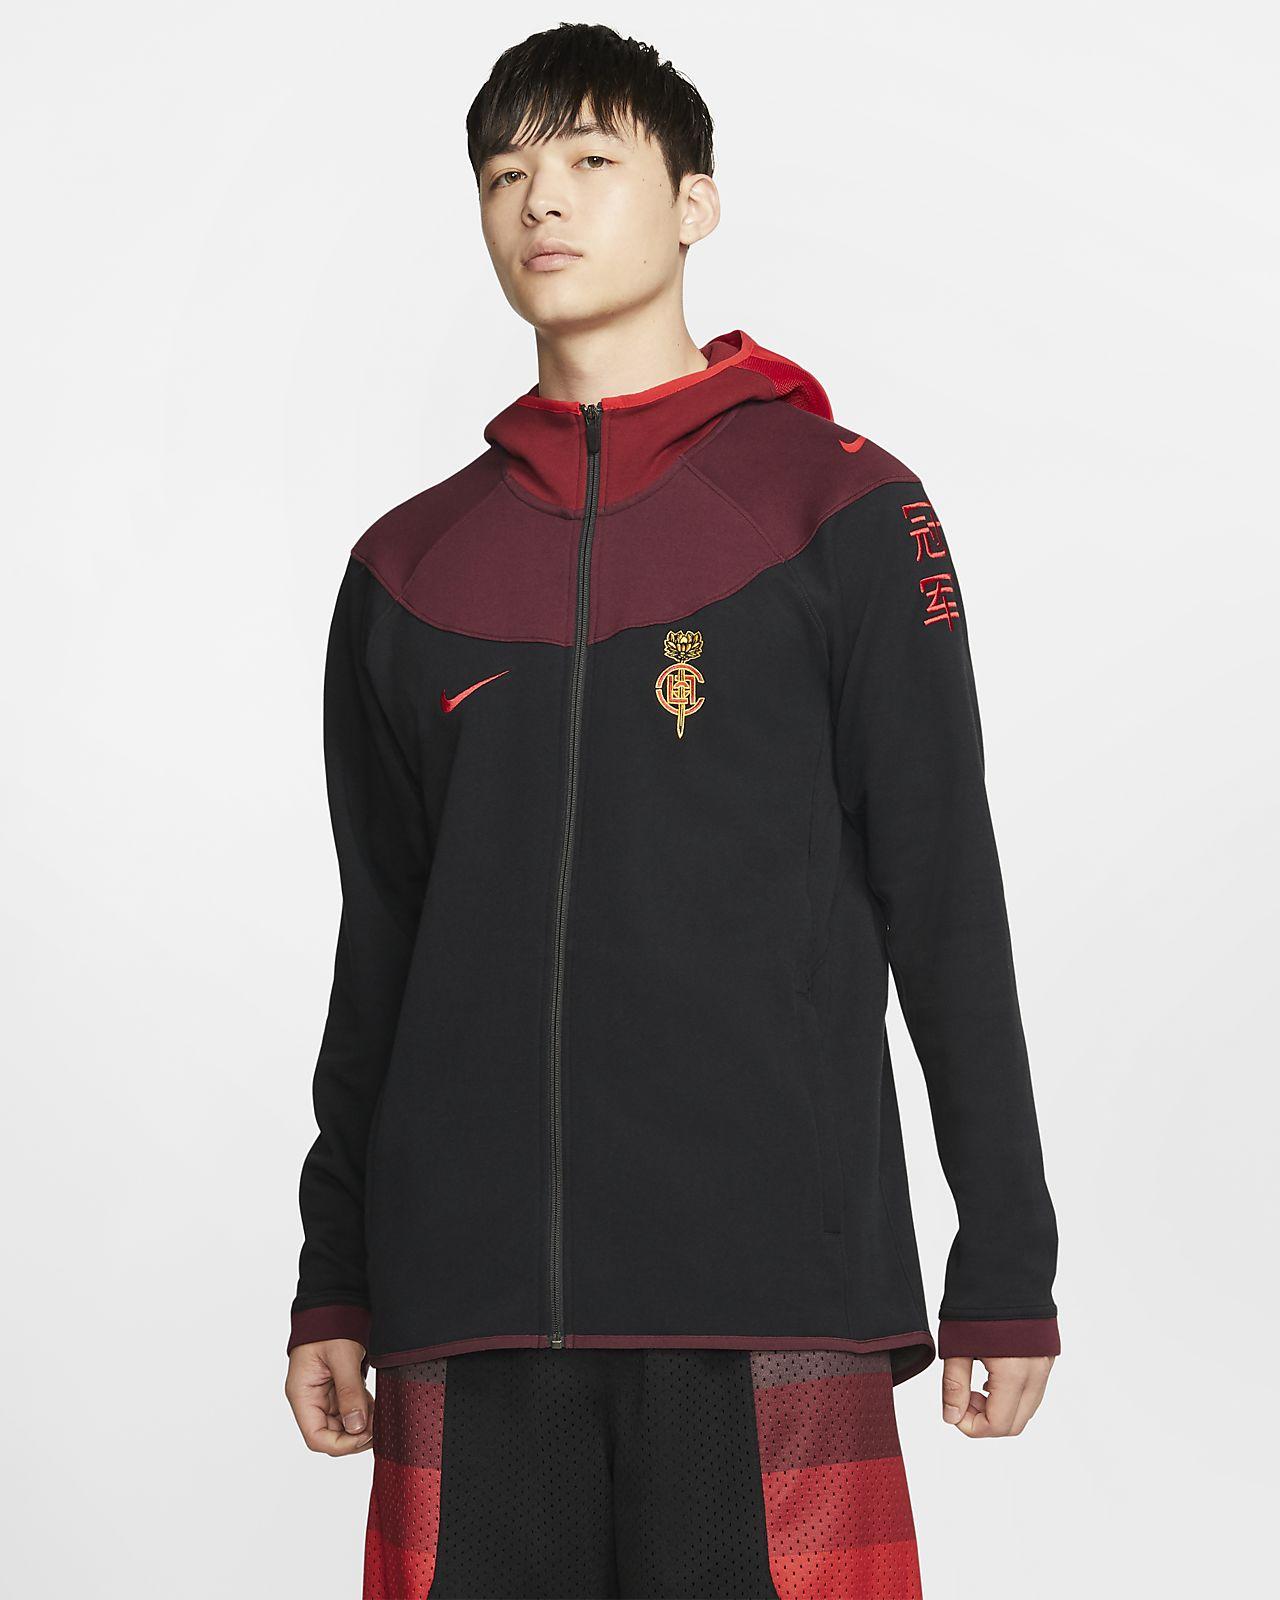 Nike x CLOT 男子连帽衫